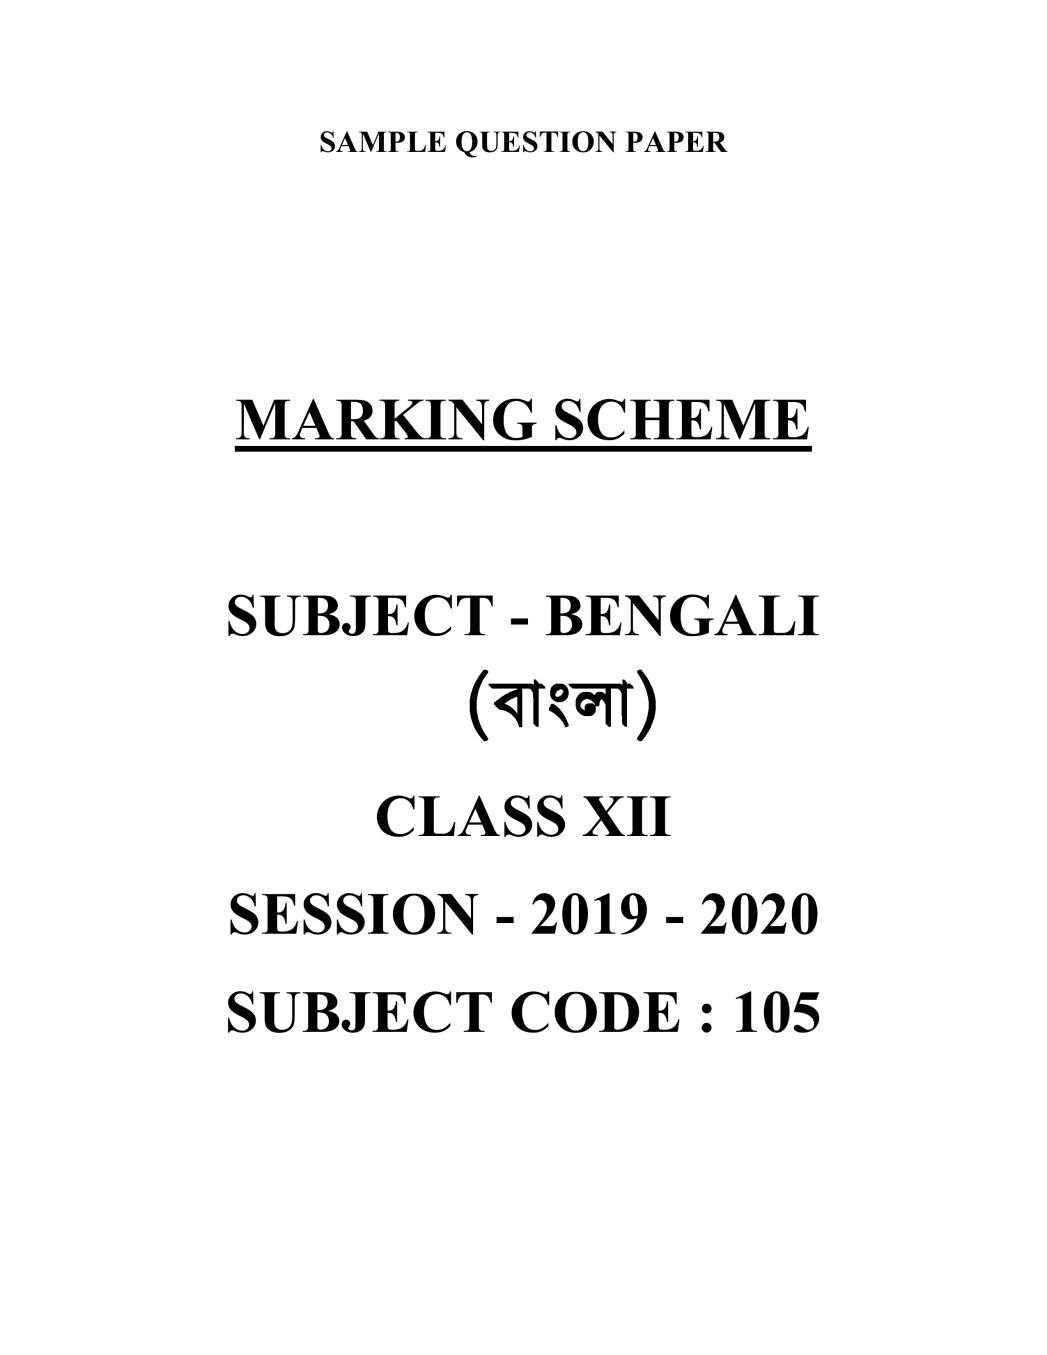 CBSE Class 12 Marking Scheme 2020 for Bengali - Page 1